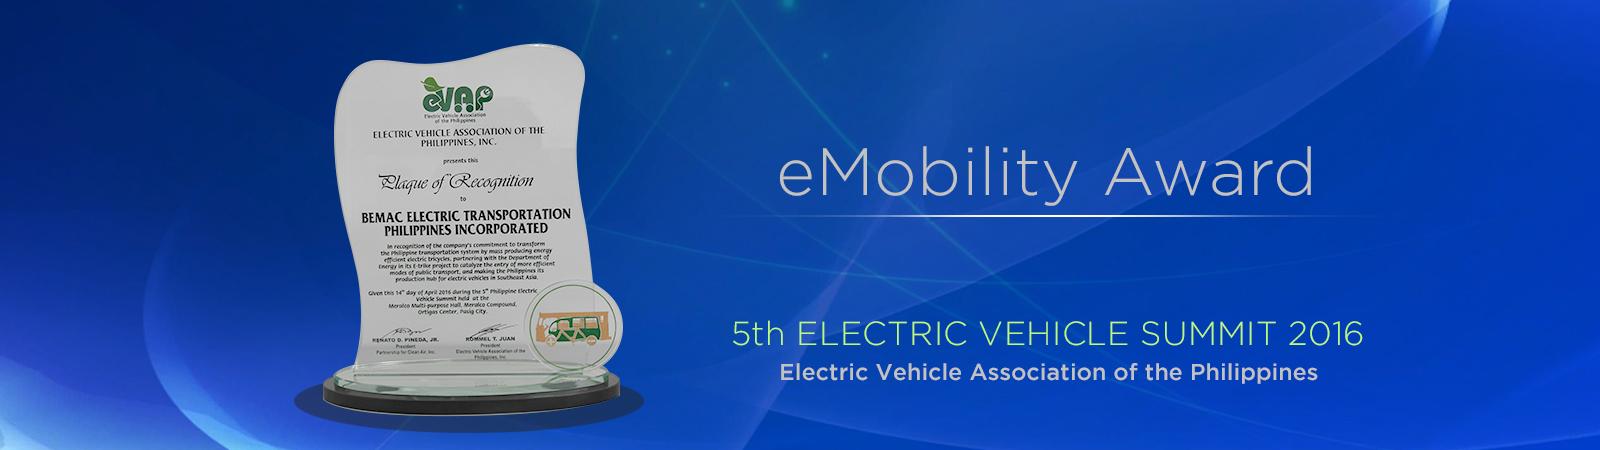 emobility-award